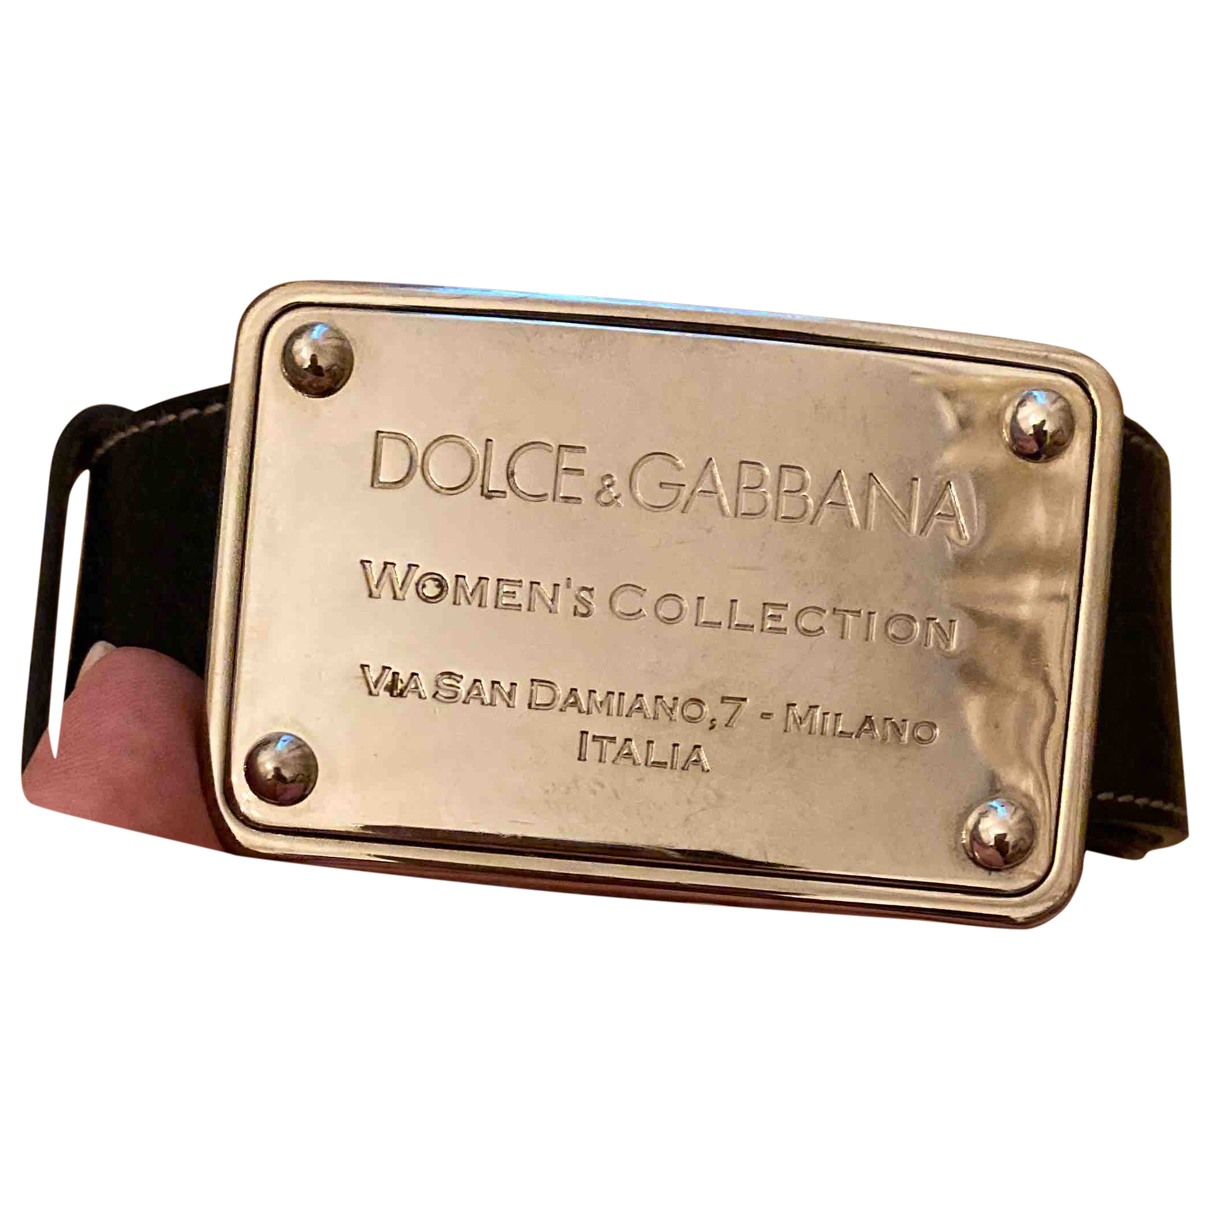 Dolce & Gabbana N Black Leather belt for Women 90 cm